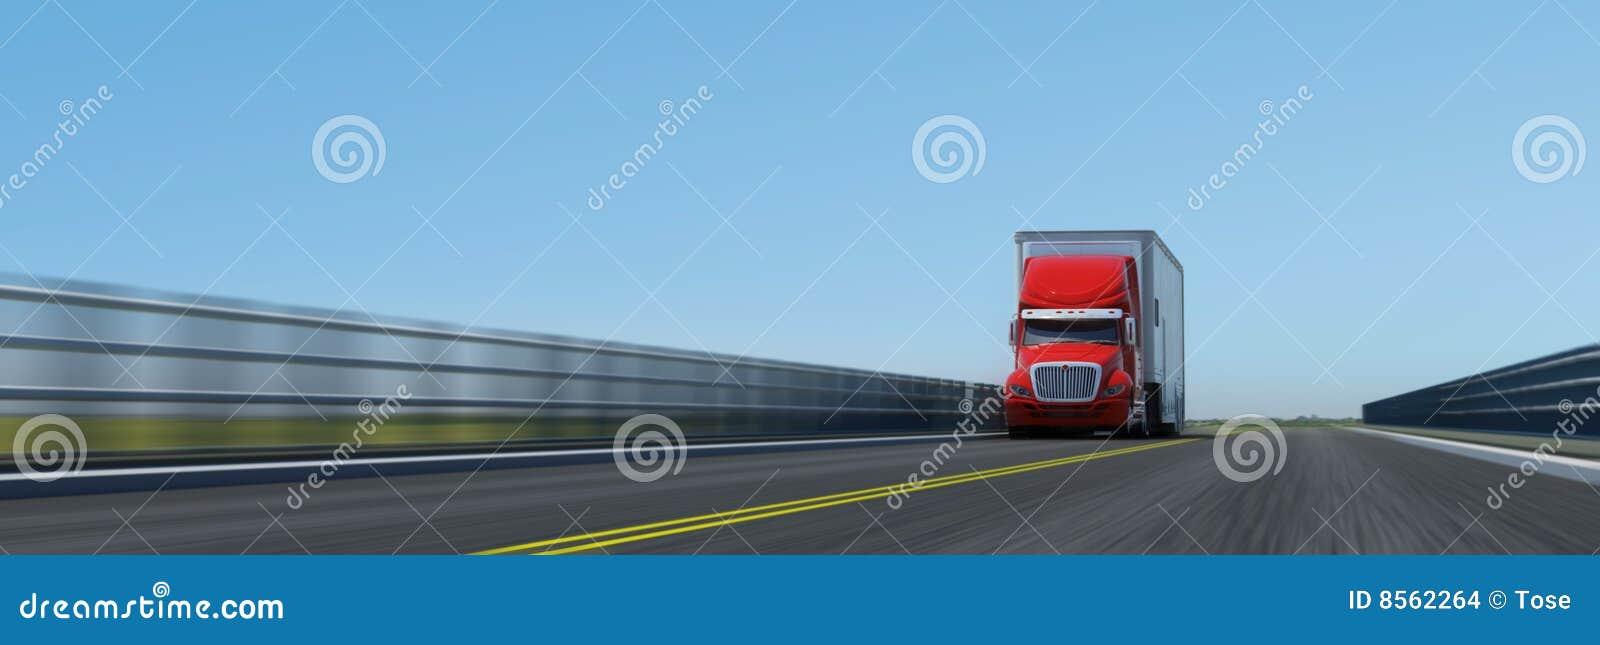 Semi-trailer on the road